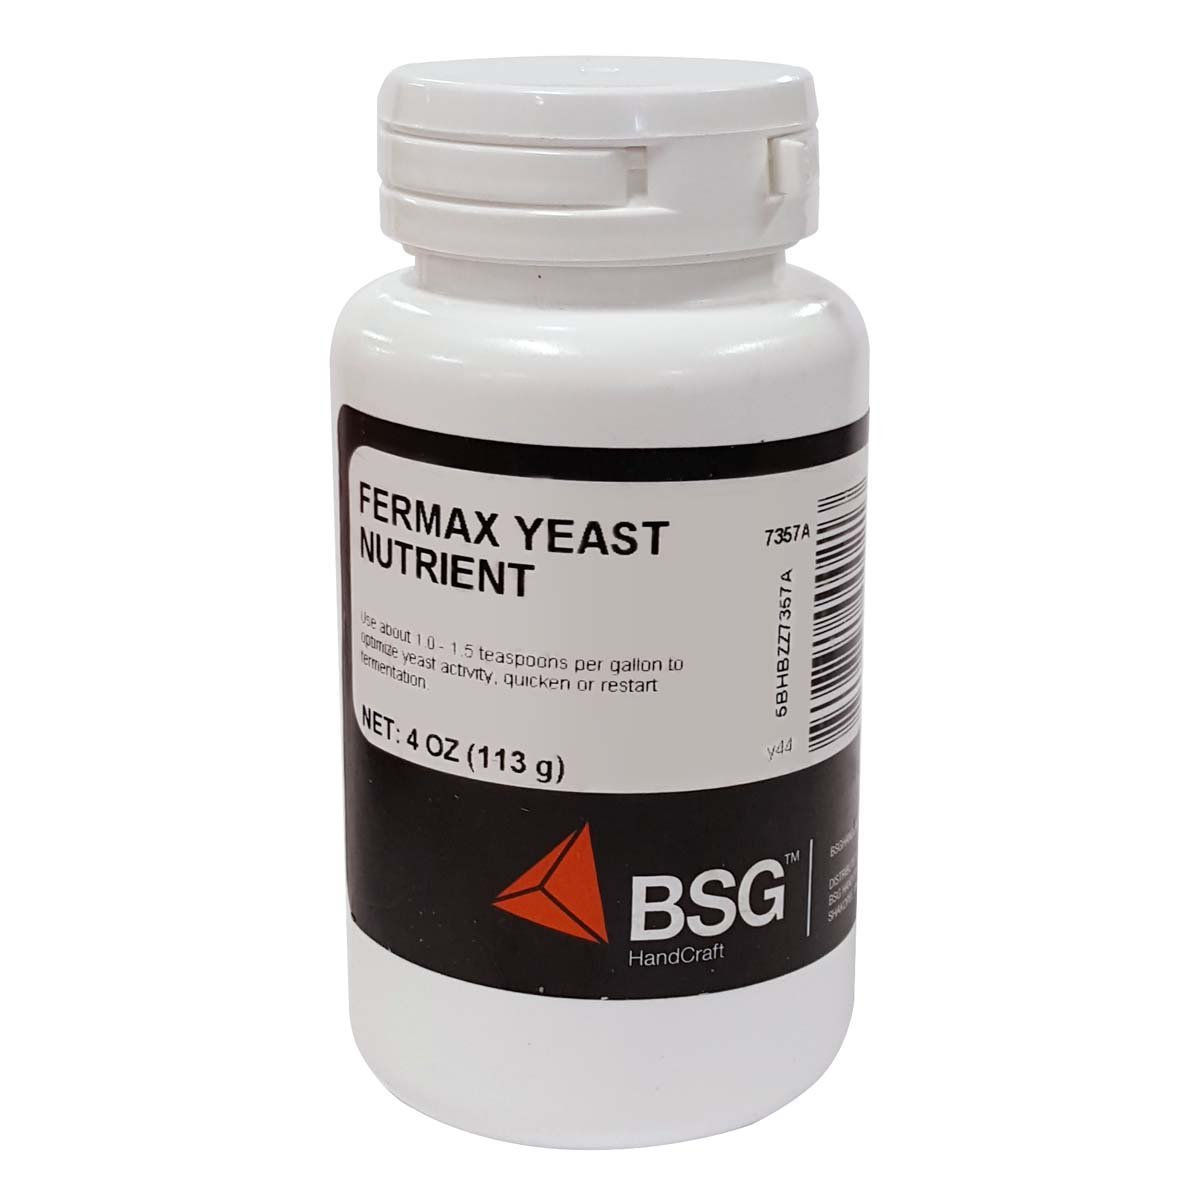 Fermax Yeast Nutrient - 4 oz.